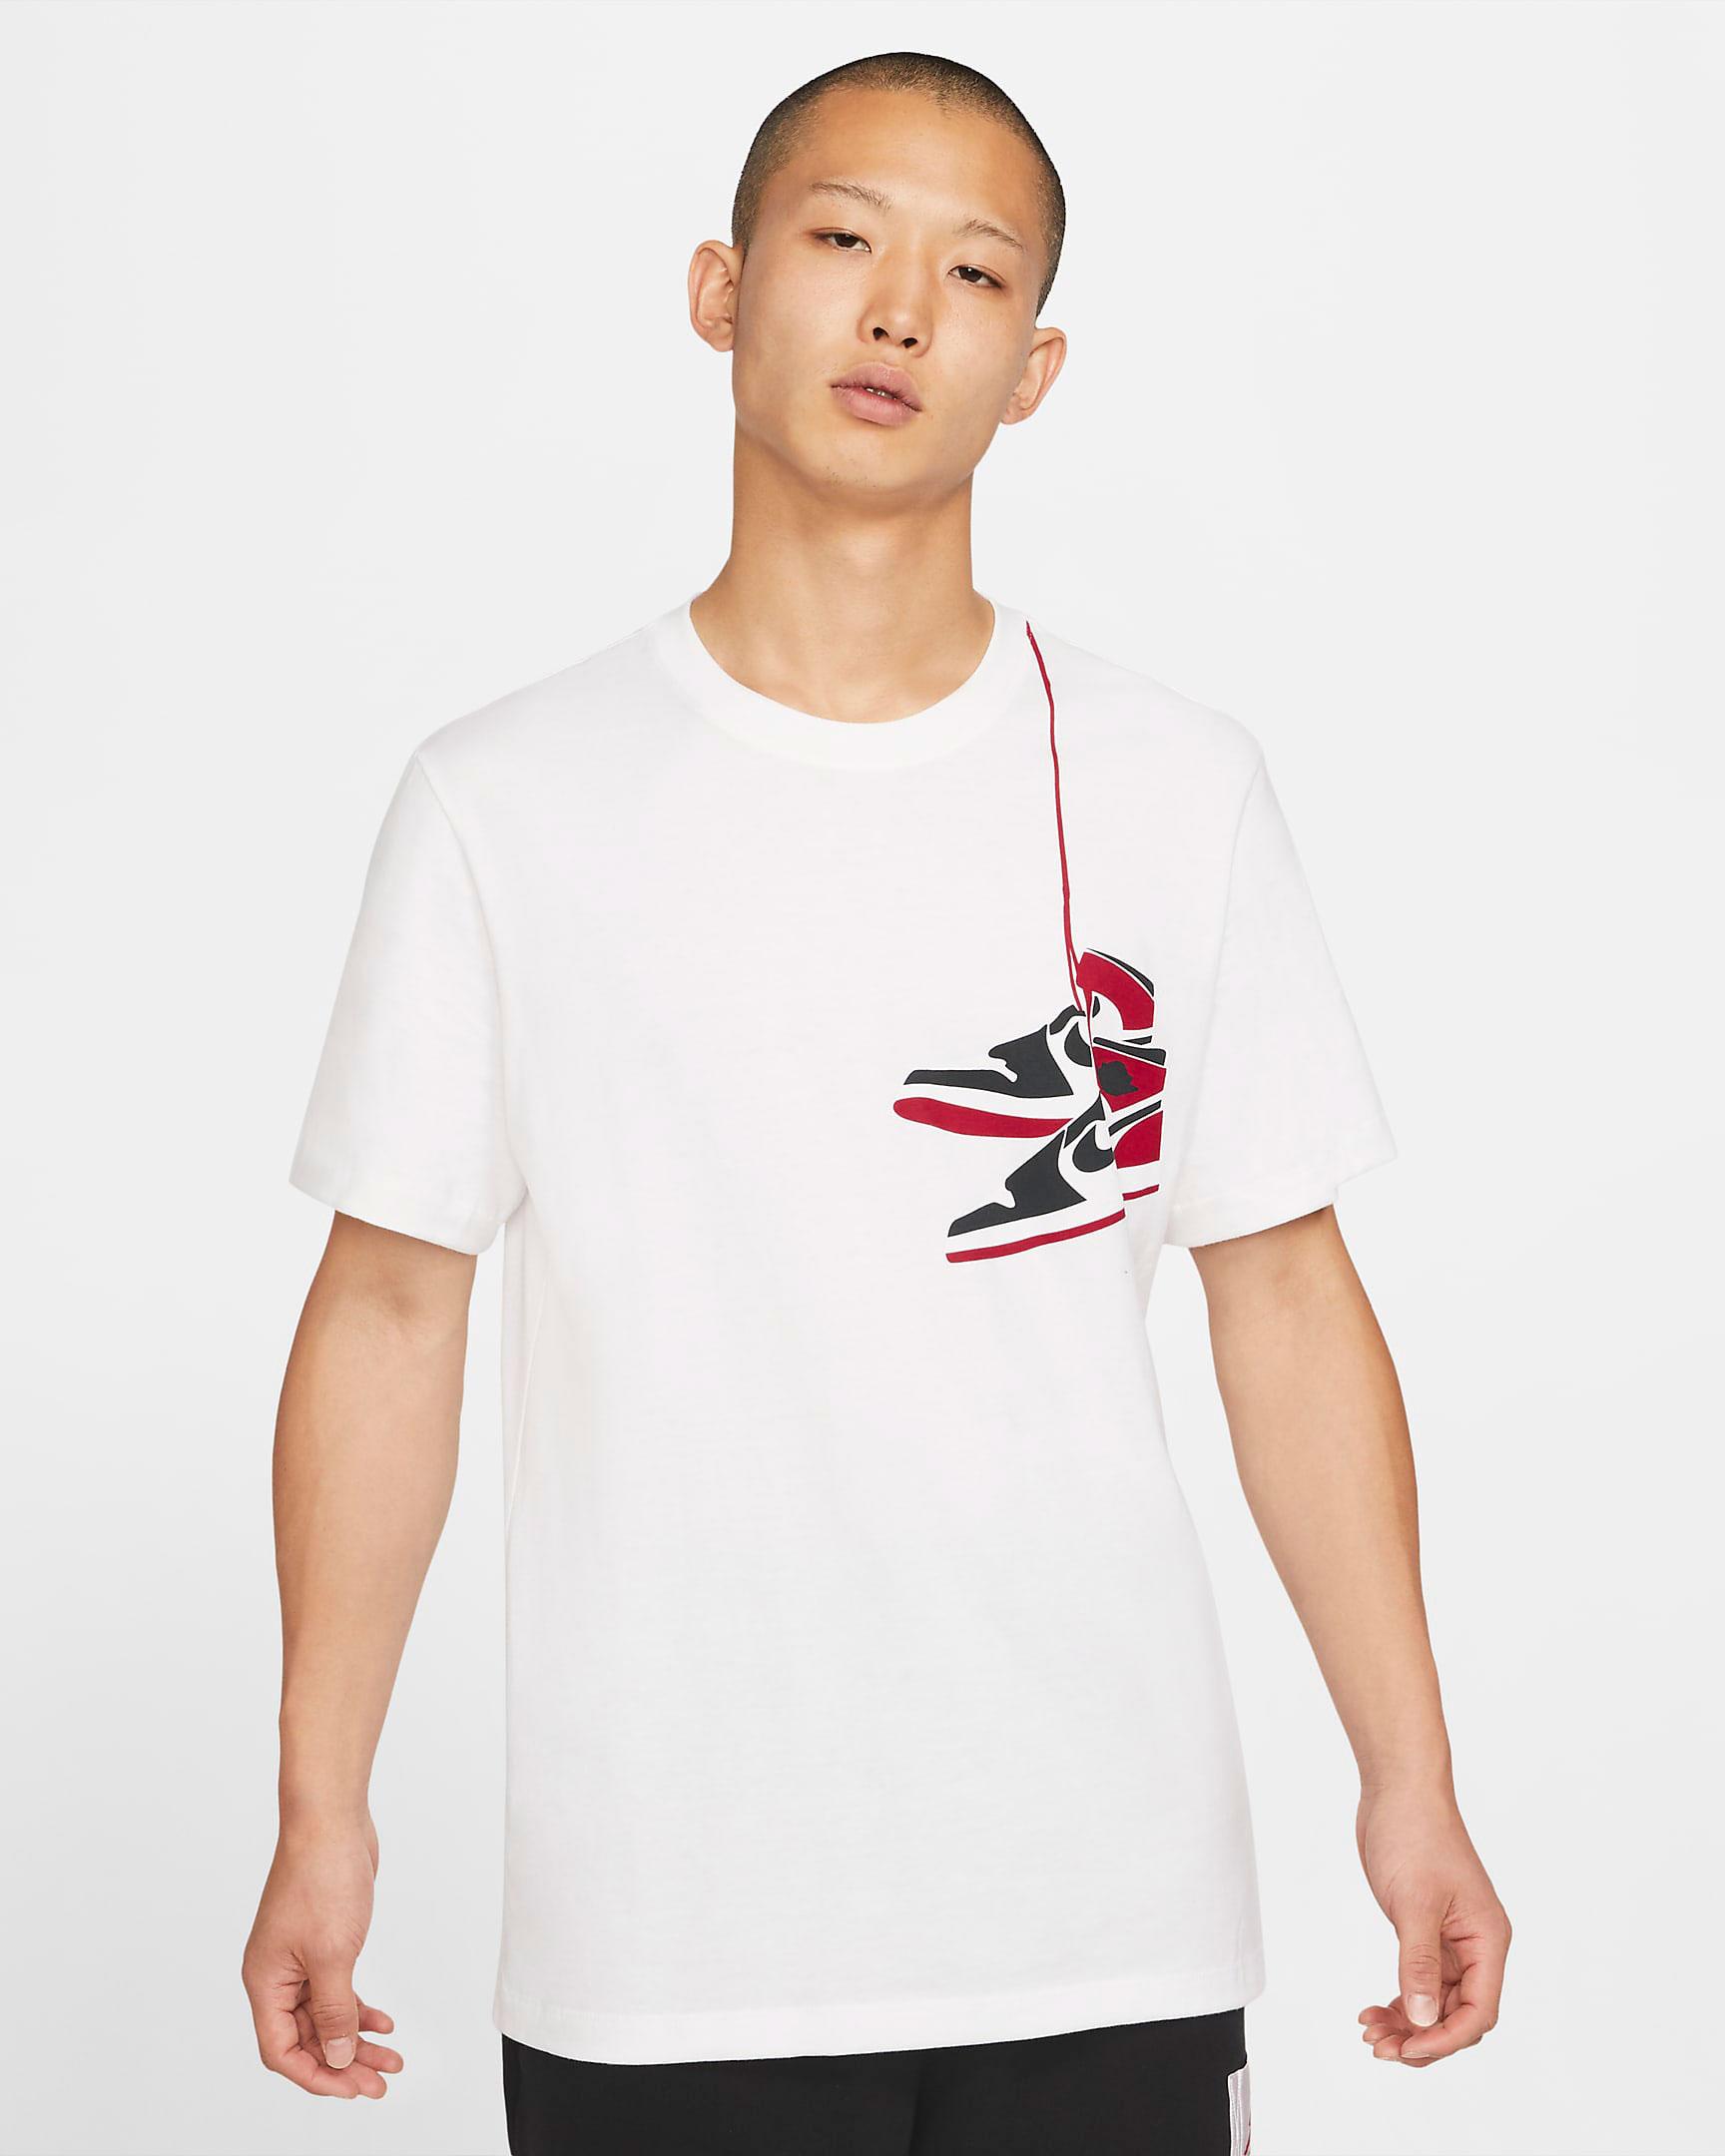 jordan-aj1-knit-stocking-holiday-shirt-white-2